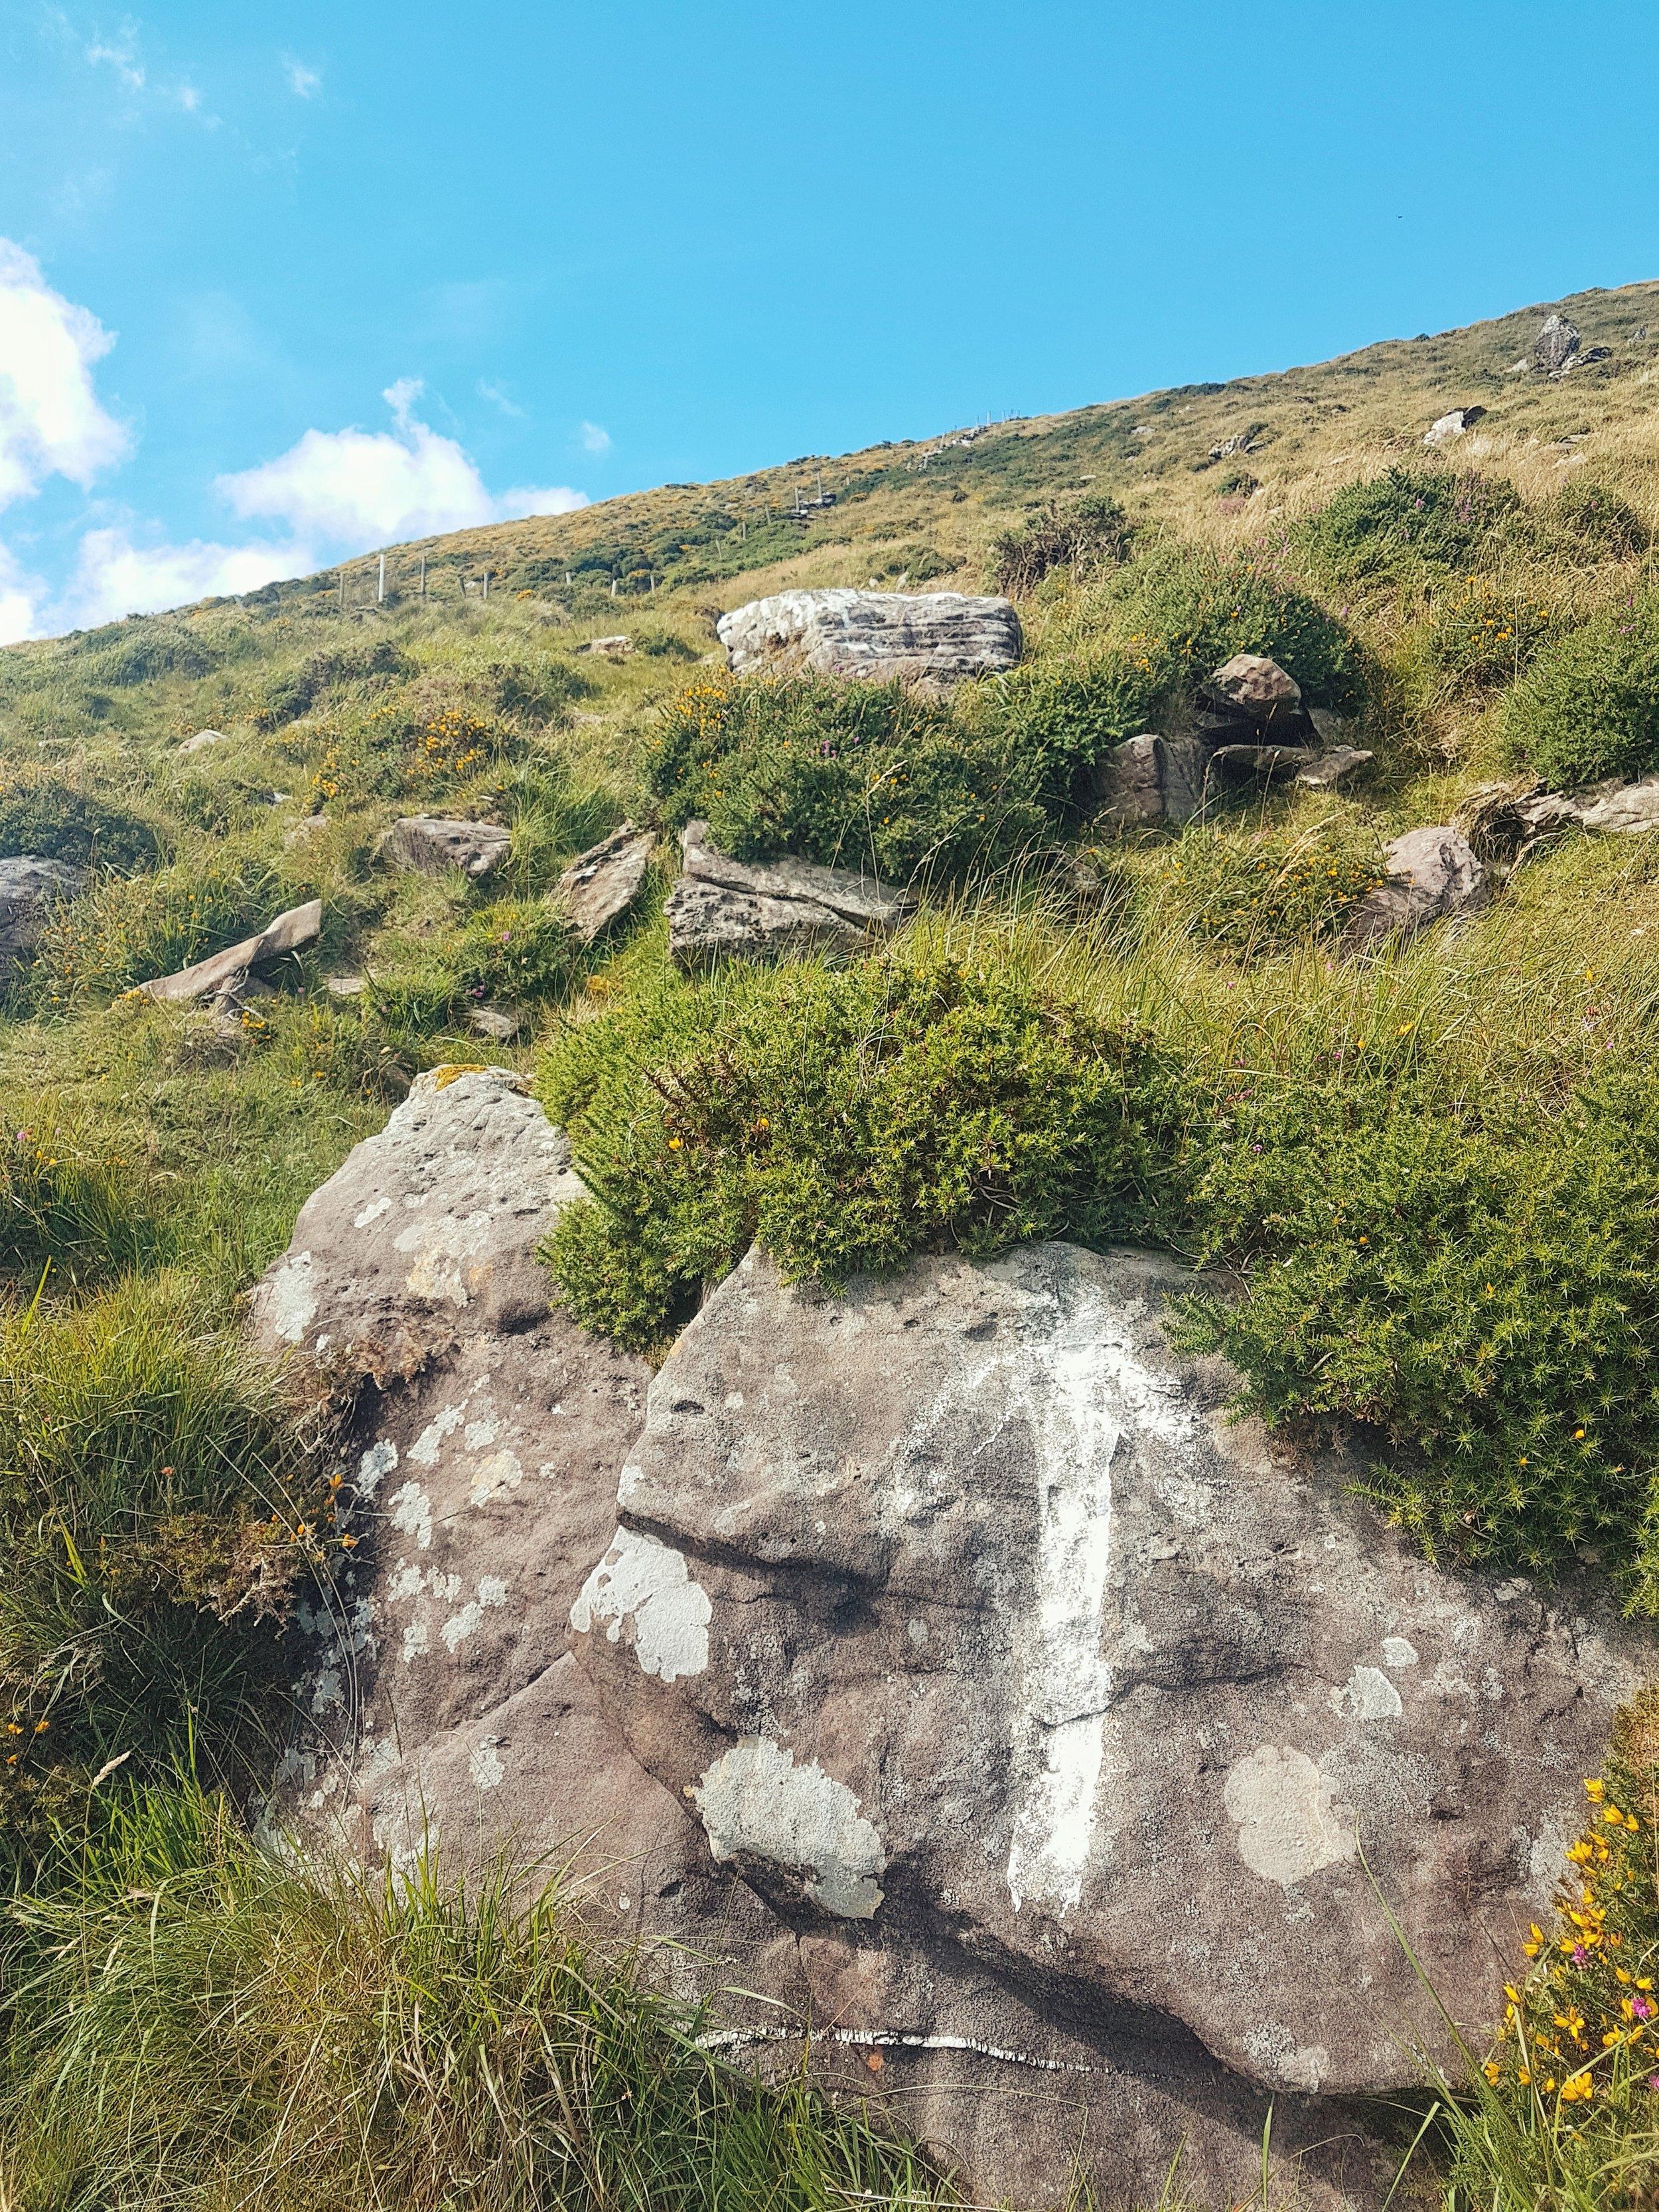 Ireland. Wild Atlantic Way. Kerry. Counthy Kerry. Travel photography. Landscape photography. Blog. Irish. Travelling Ireland. Ireland west coast. Wild Landscape. Trip. Vacation.  (6).jpg